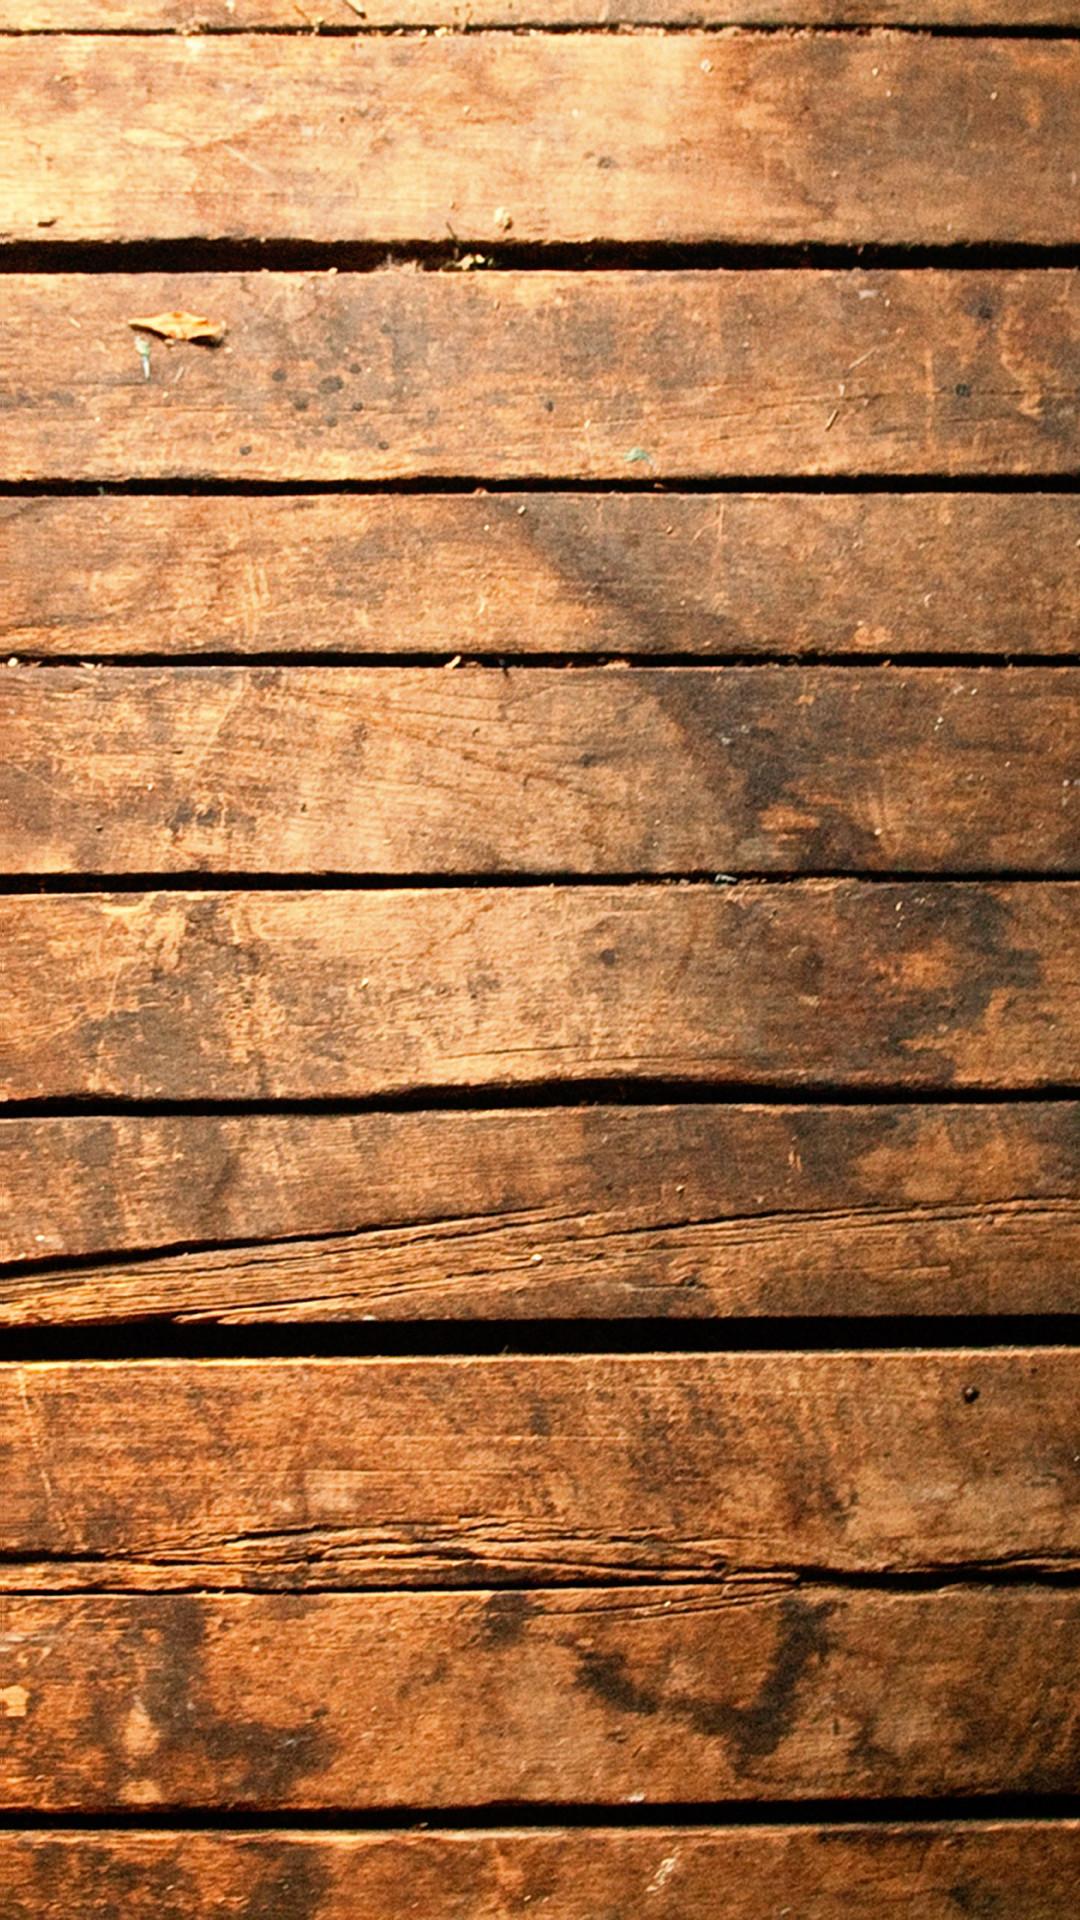 Res: 1080x1920, Earthy Wood Phone Wallpaper